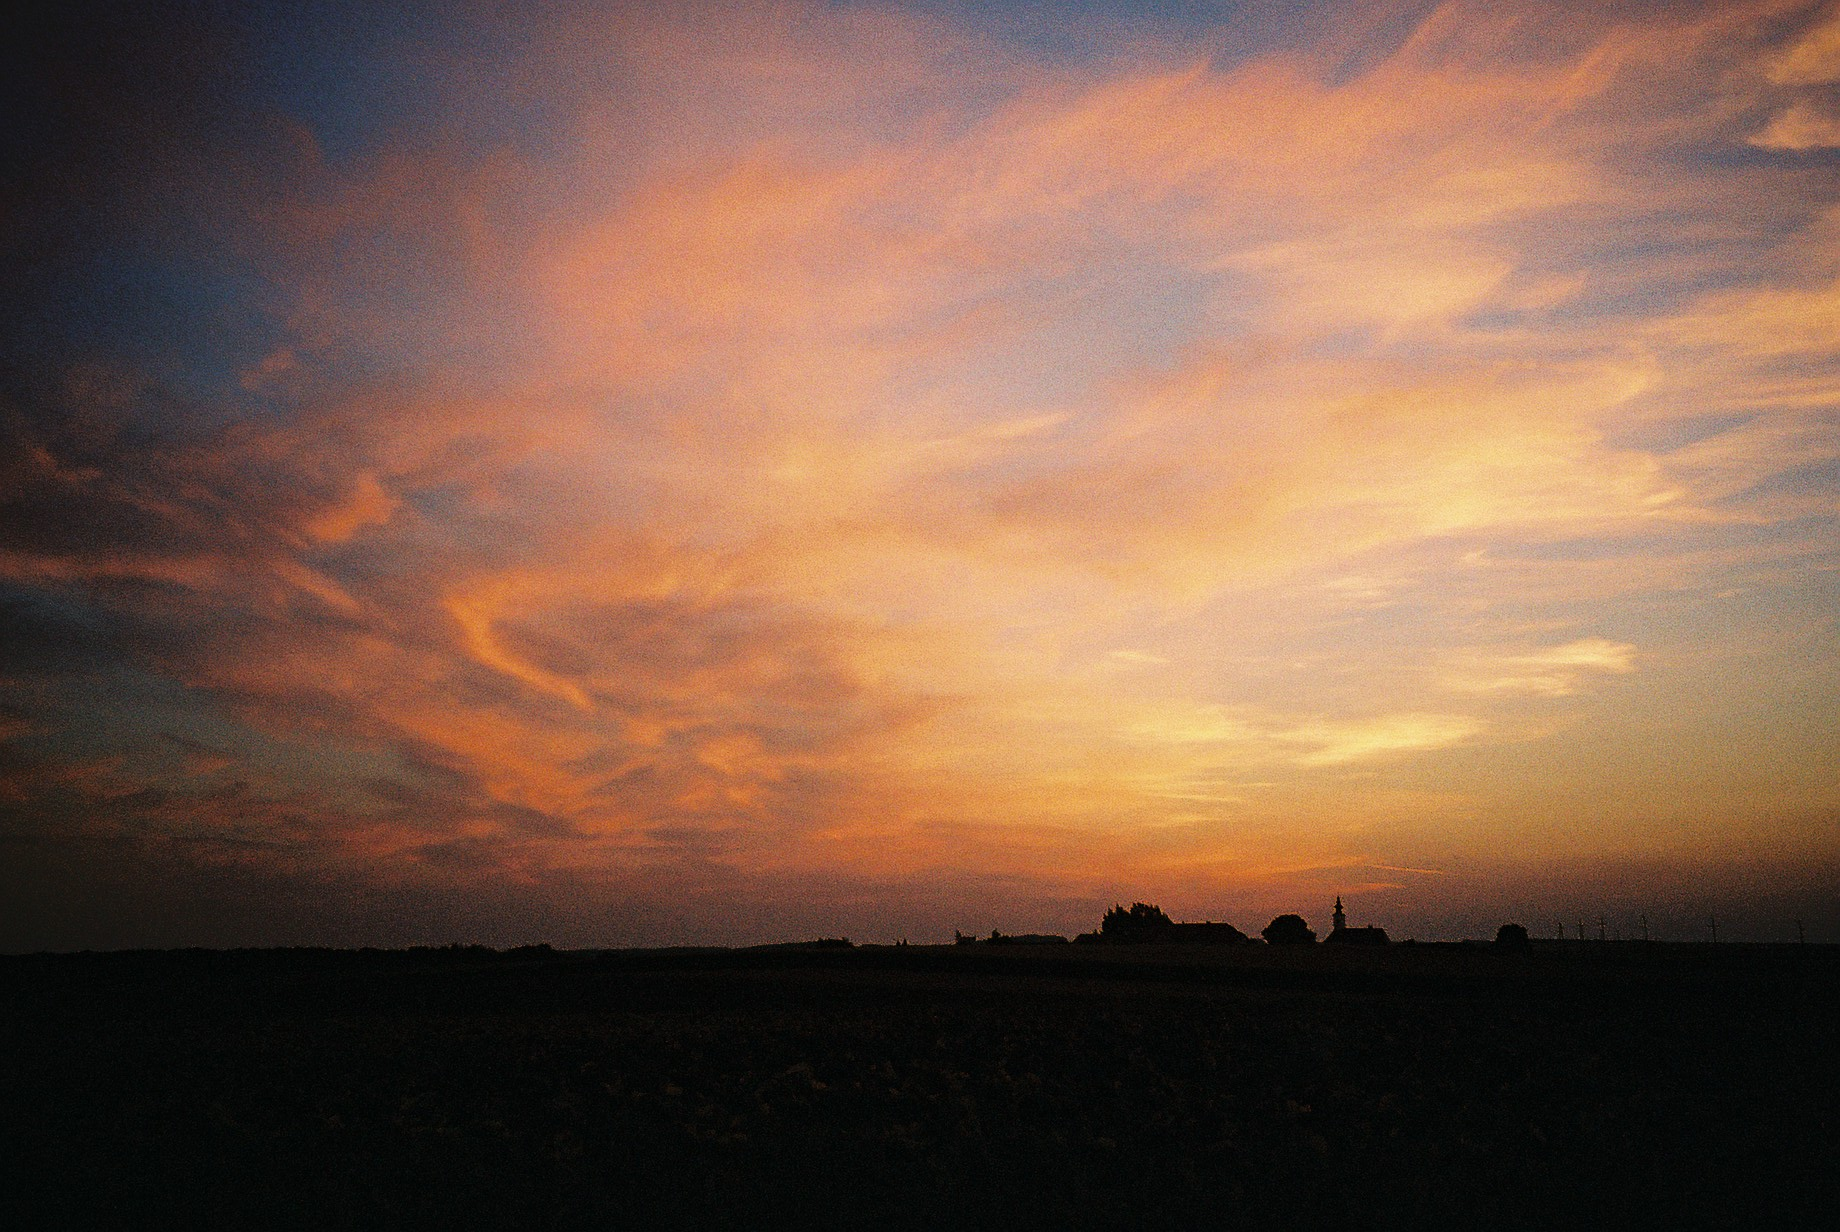 Sonnenuntergang in Geras